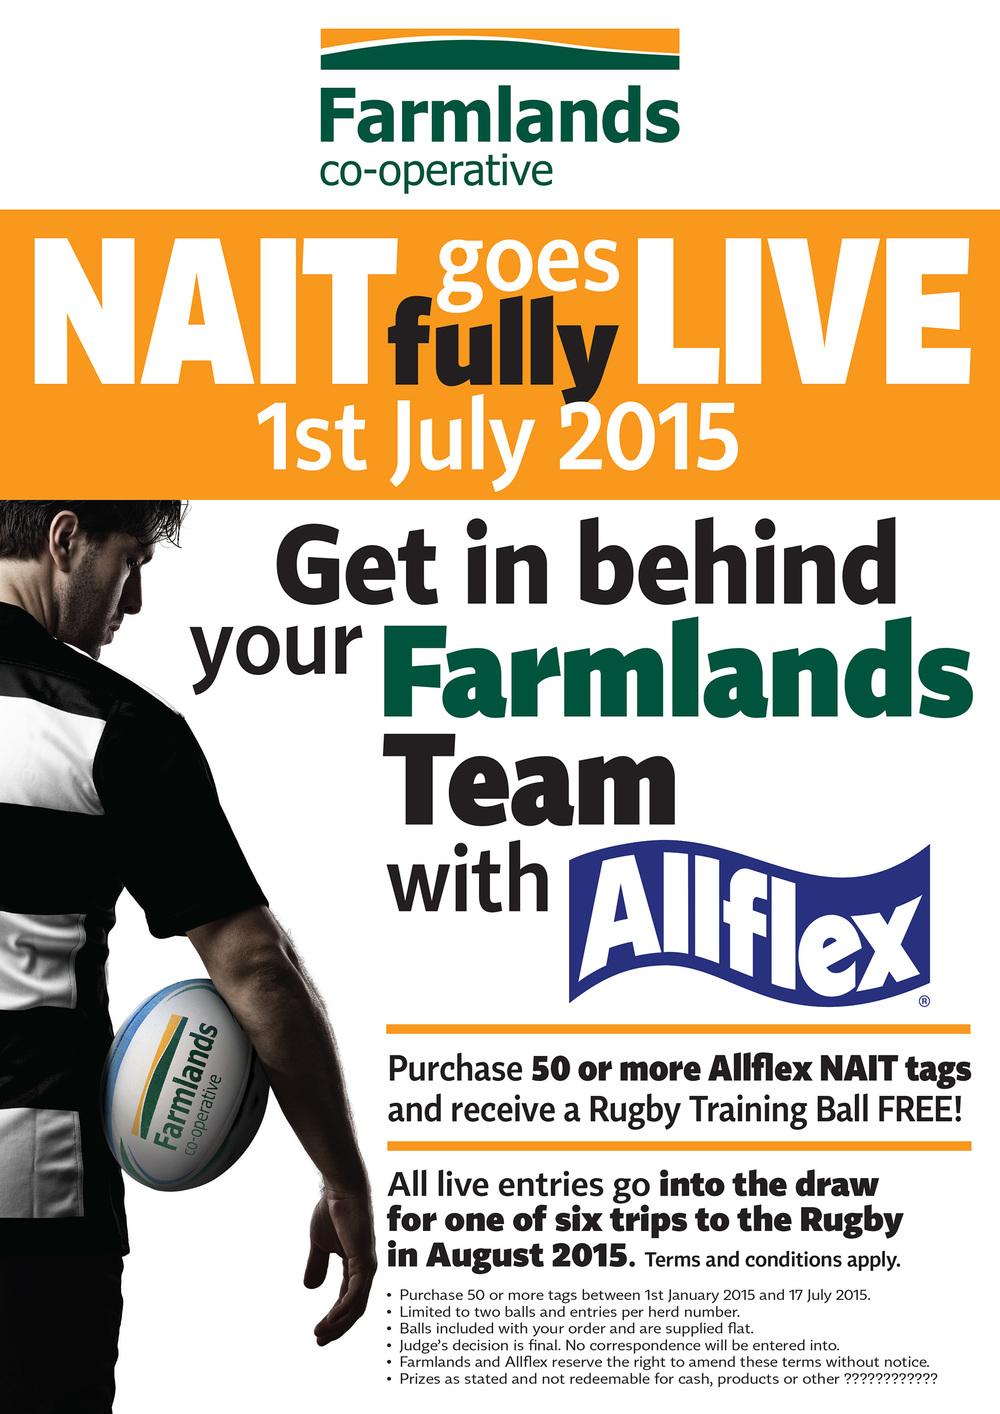 Farmlands NAIT live flyer-1.jpg